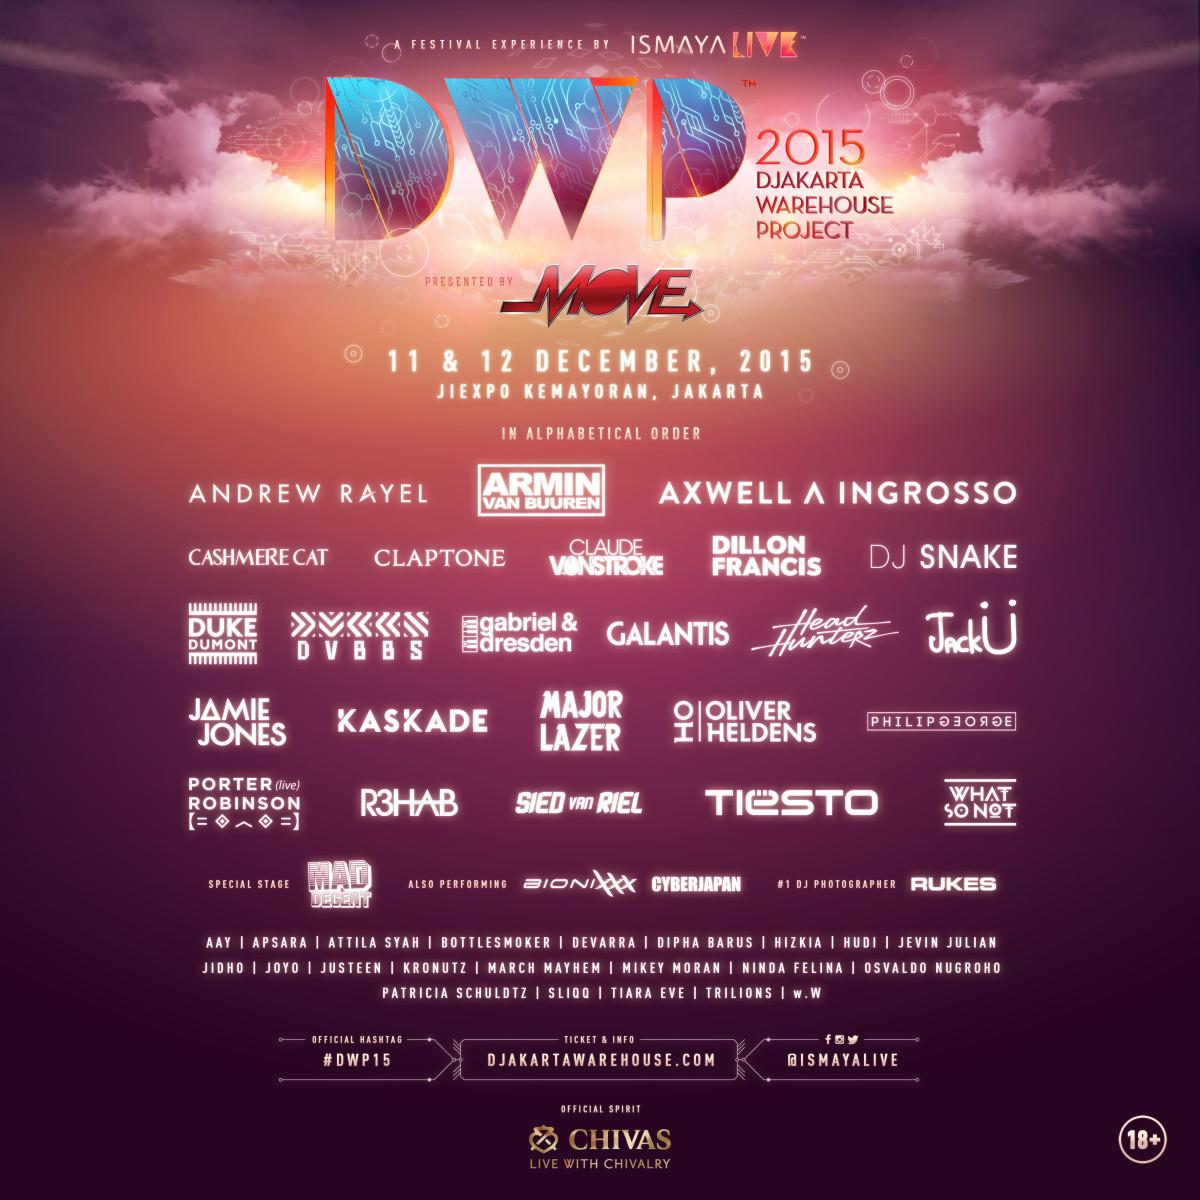 Djakarta Warehouse Project lineup